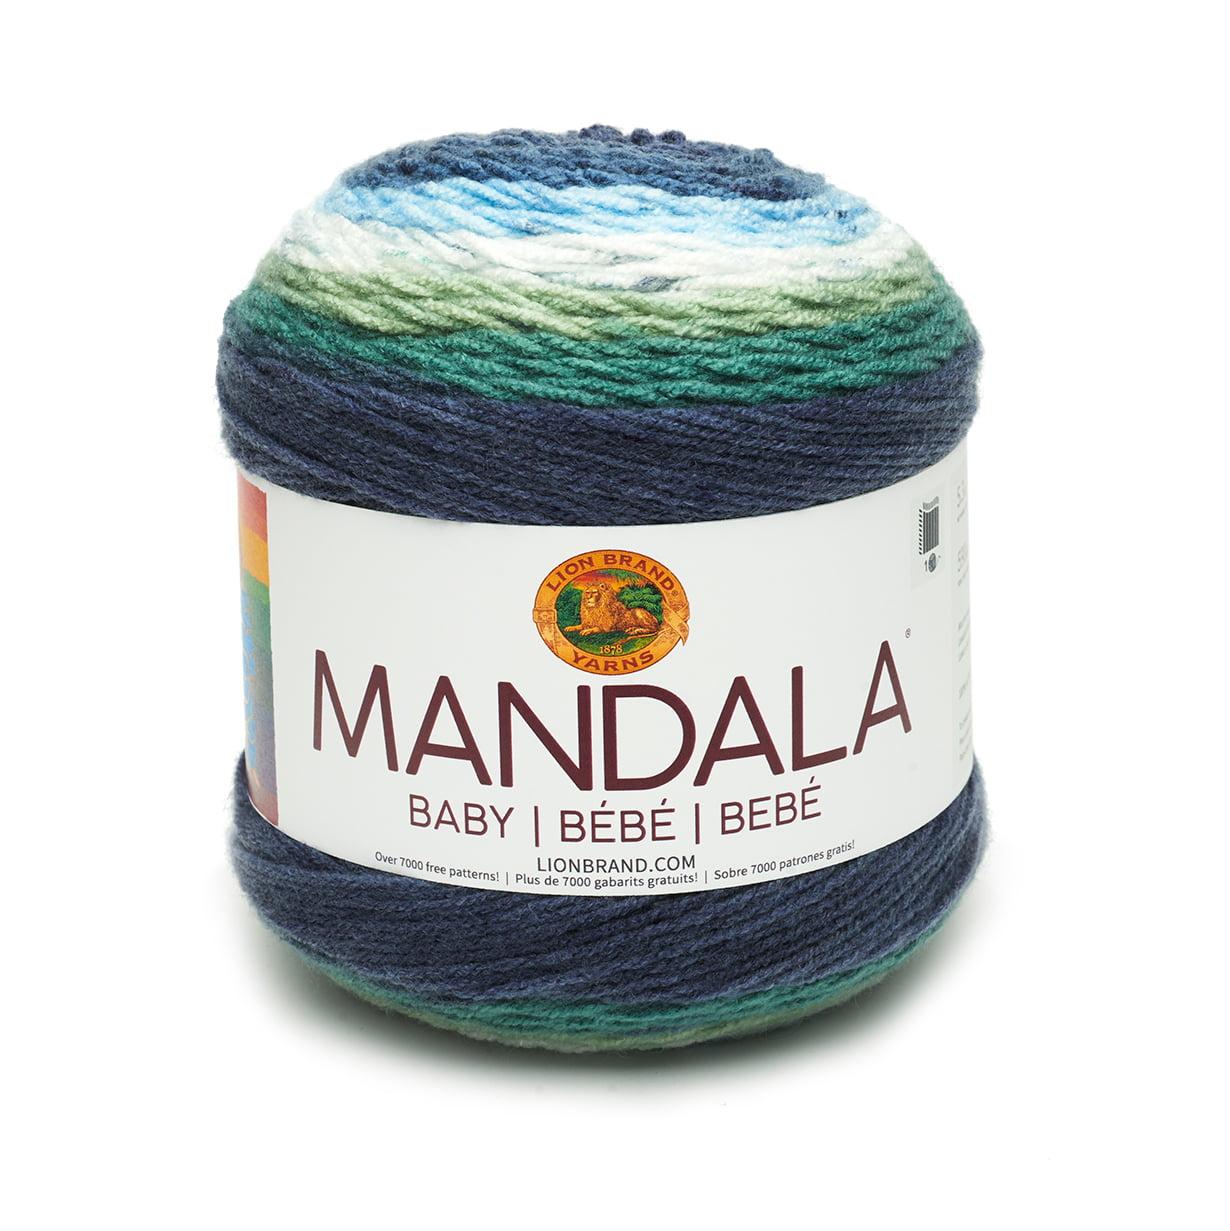 Lion Brand Yarn 526-205 Mandala Baby Echo Caves Baby Yarn